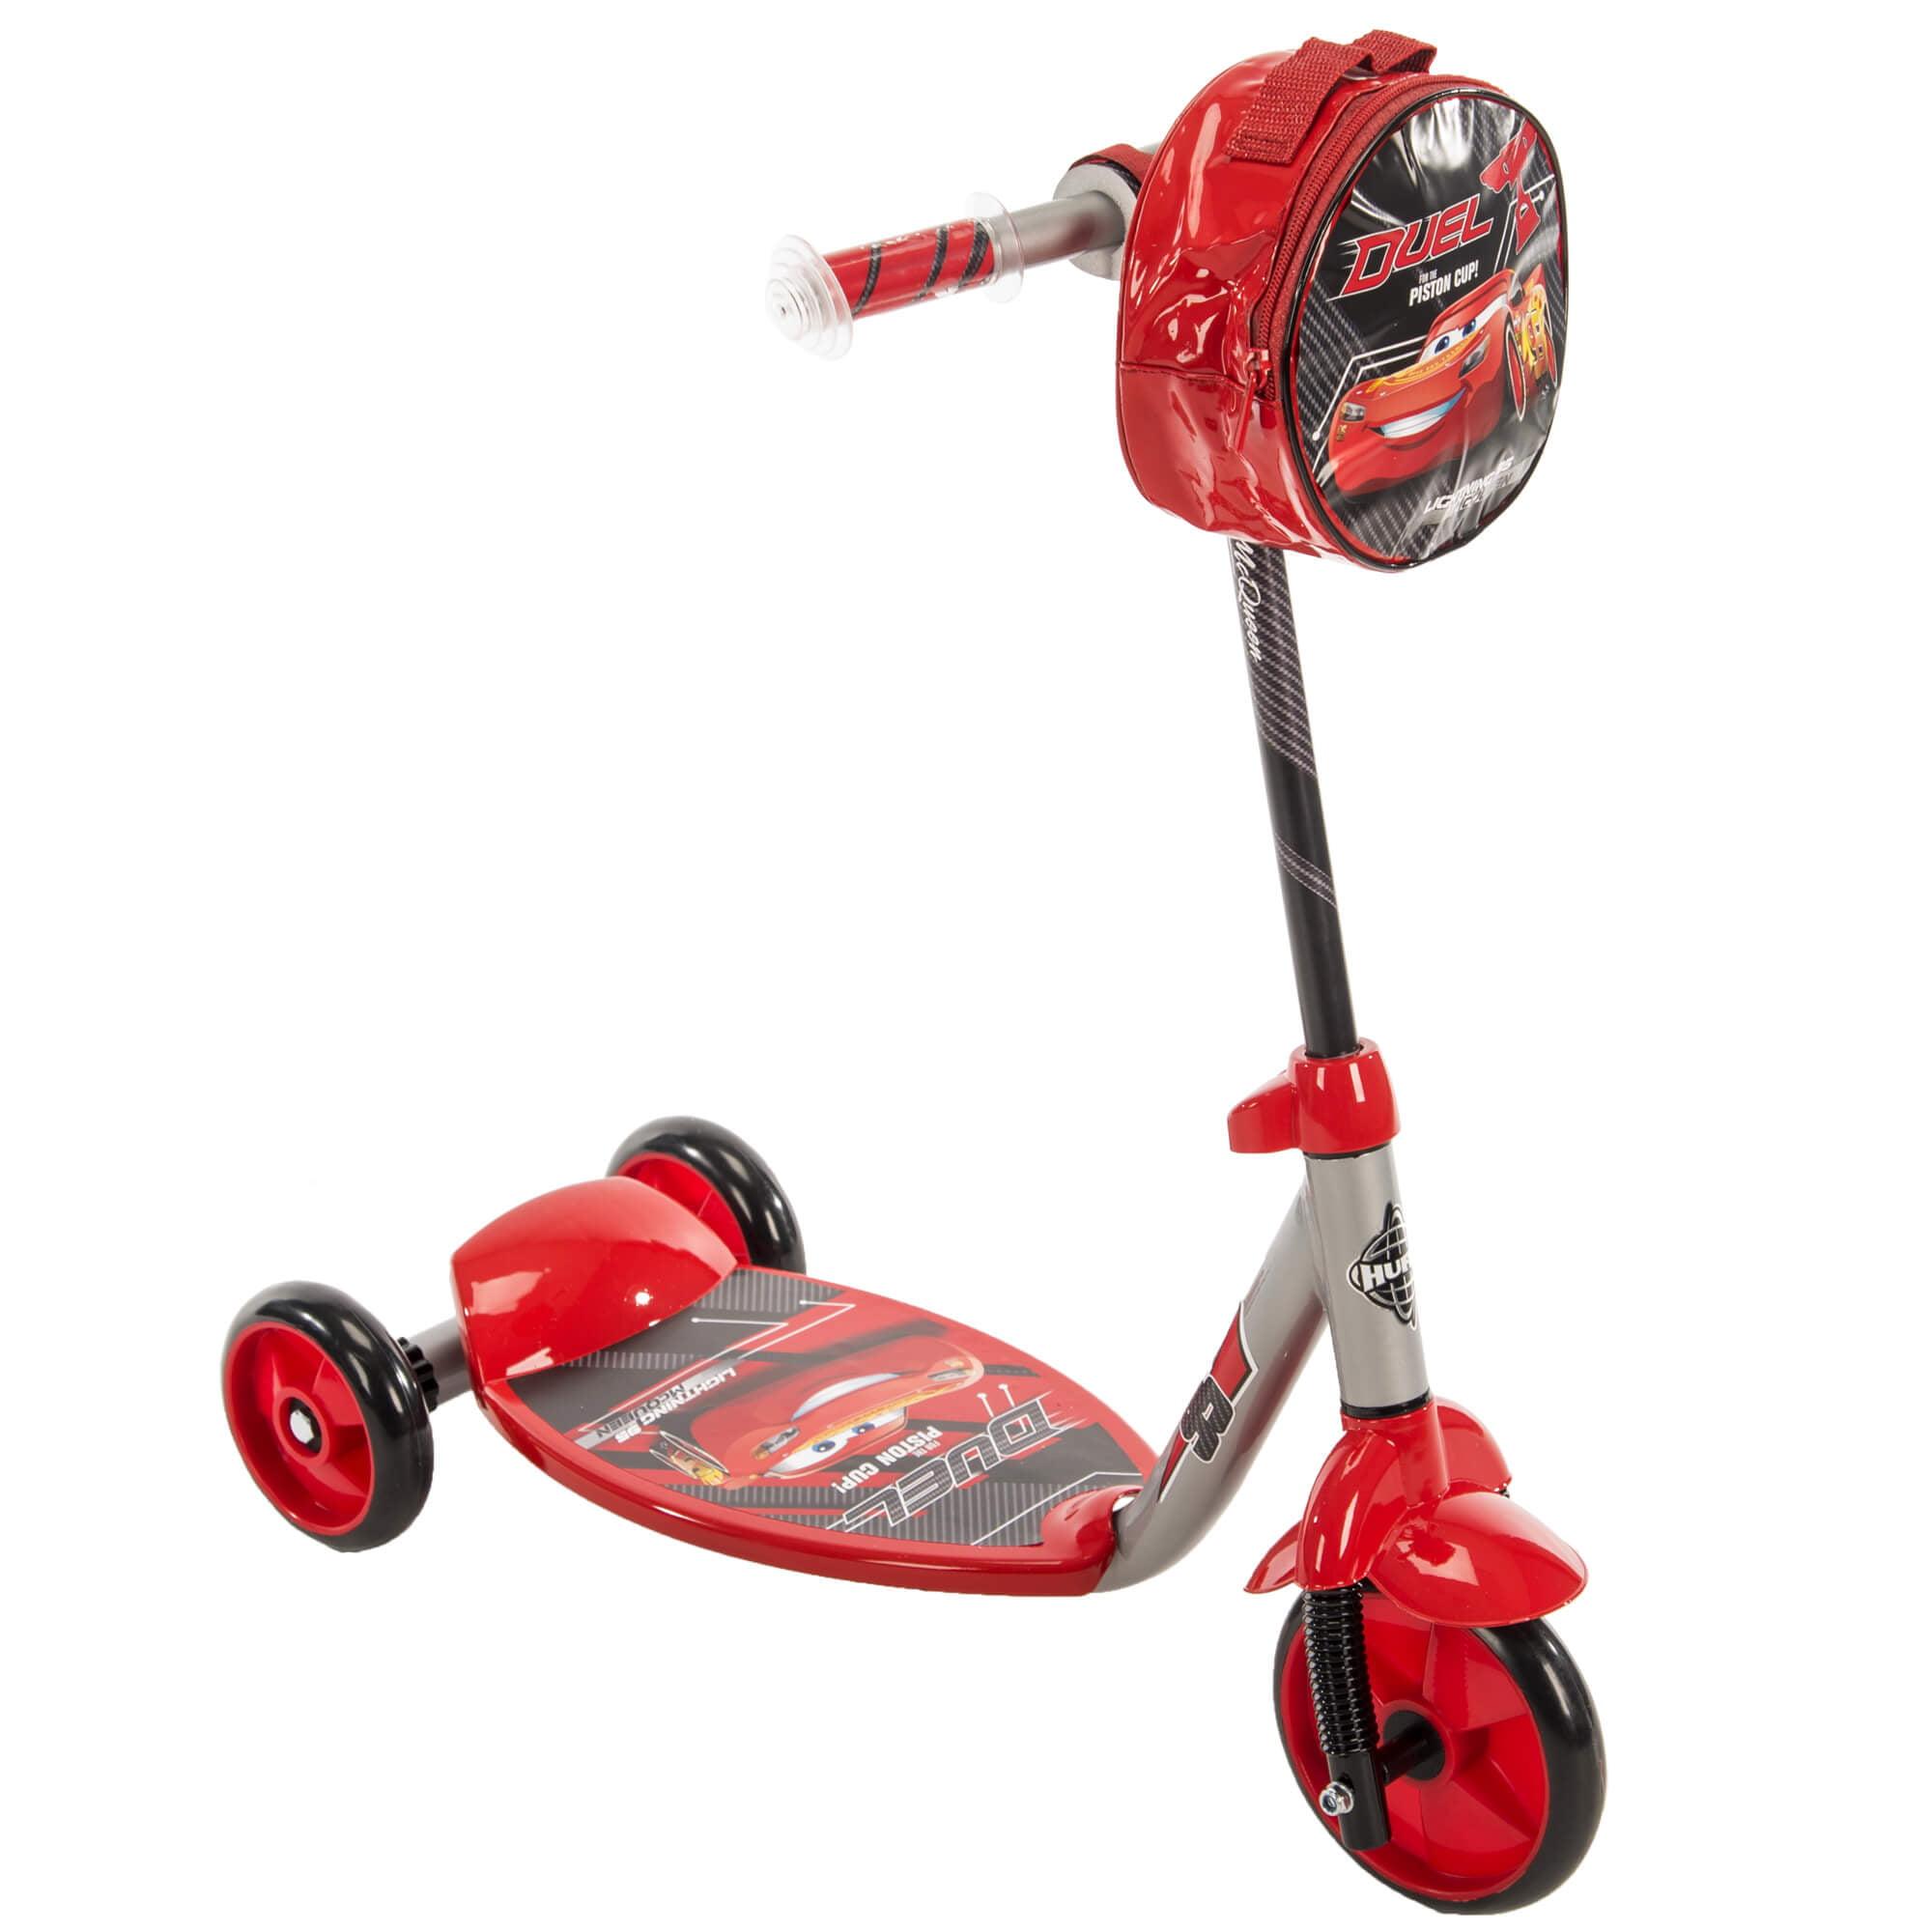 Disney Pixar Cars Lightning McQueen 3-Wheel Preschool Scooter, by huffy by Huffy